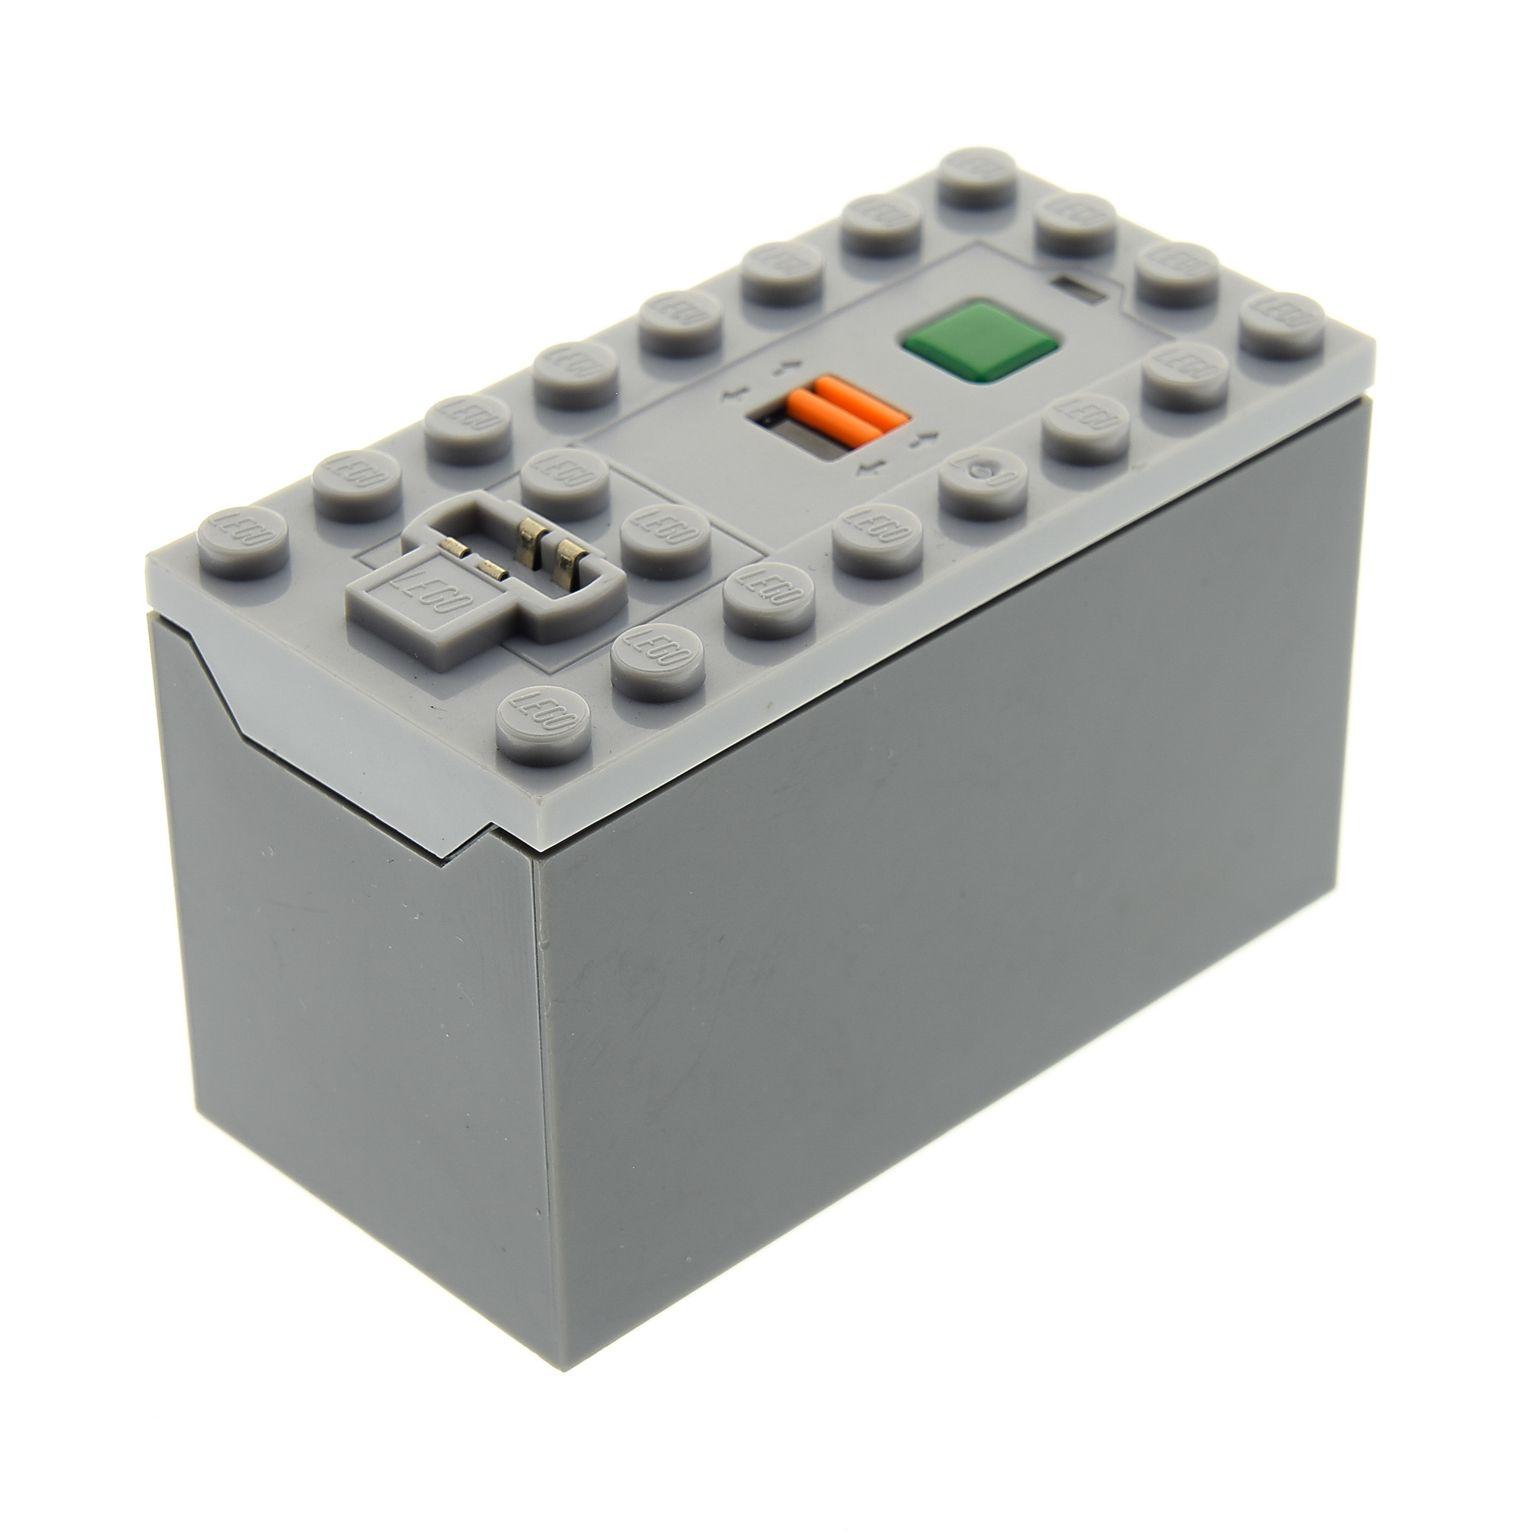 1x Lego Technic Batteriekasten grau 9V Battery Box geprüft 4578042 87513c01